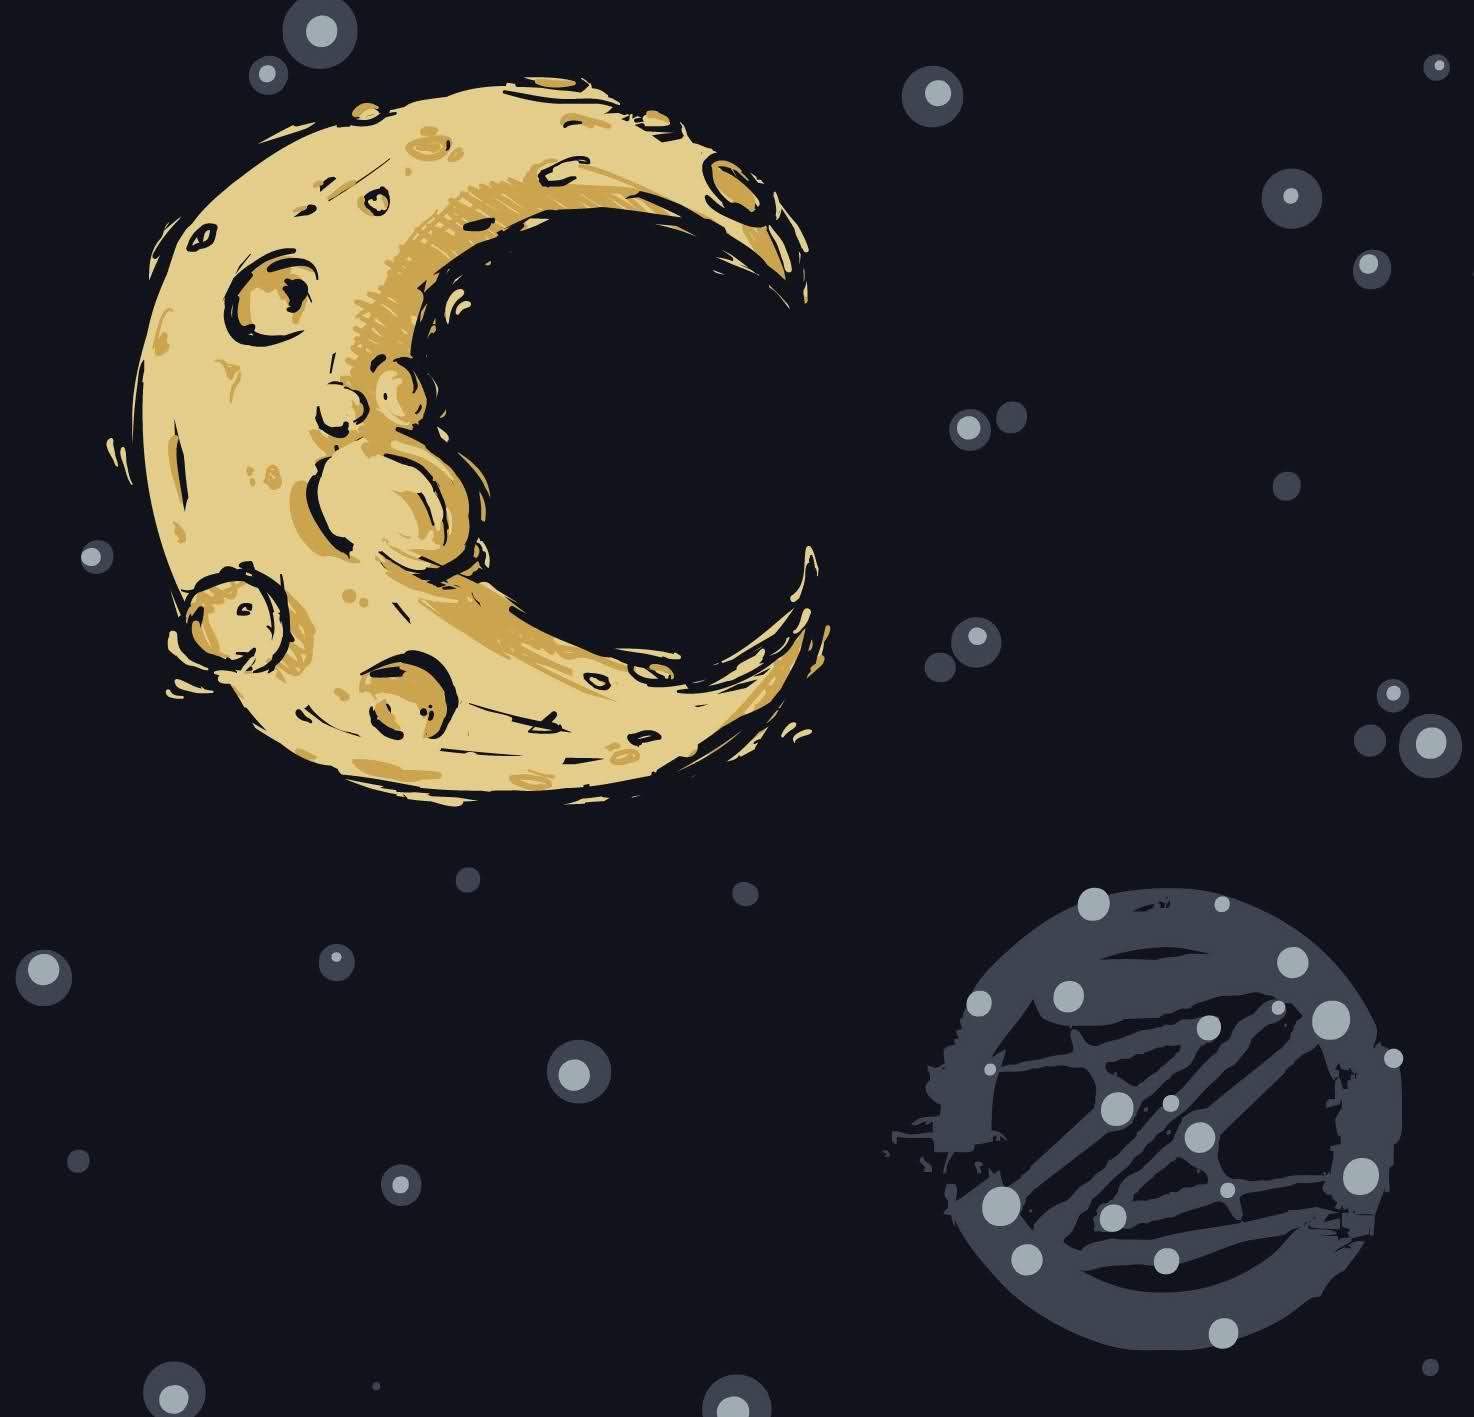 Zaa -  Full Scale Riot/Moonlight (Single)